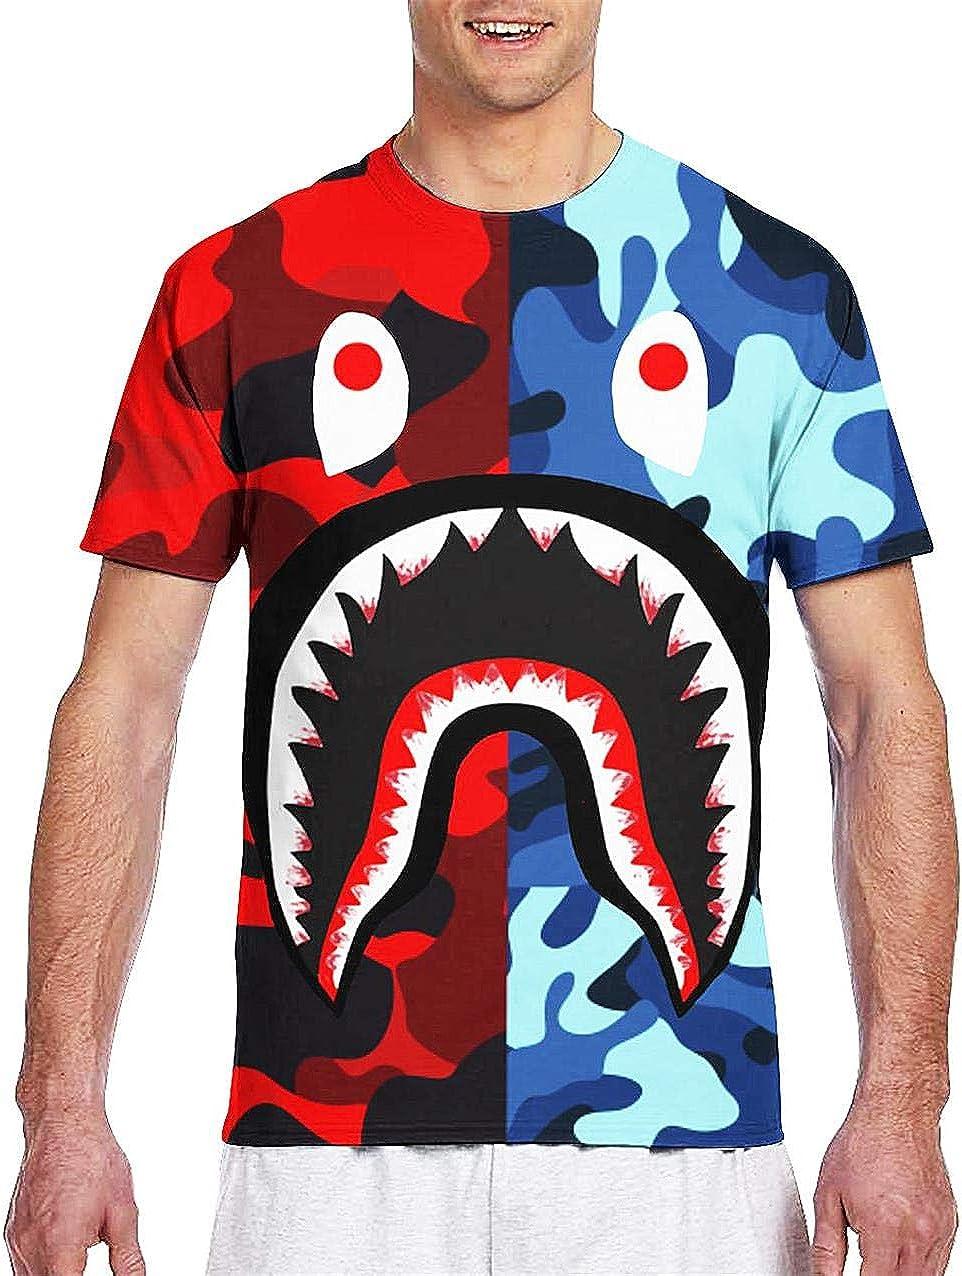 Moc.Deamiarr Bape Blood Shark Shirt 3D Print Big Mouth Shark t Shirt for Youth Teen Boys Mens